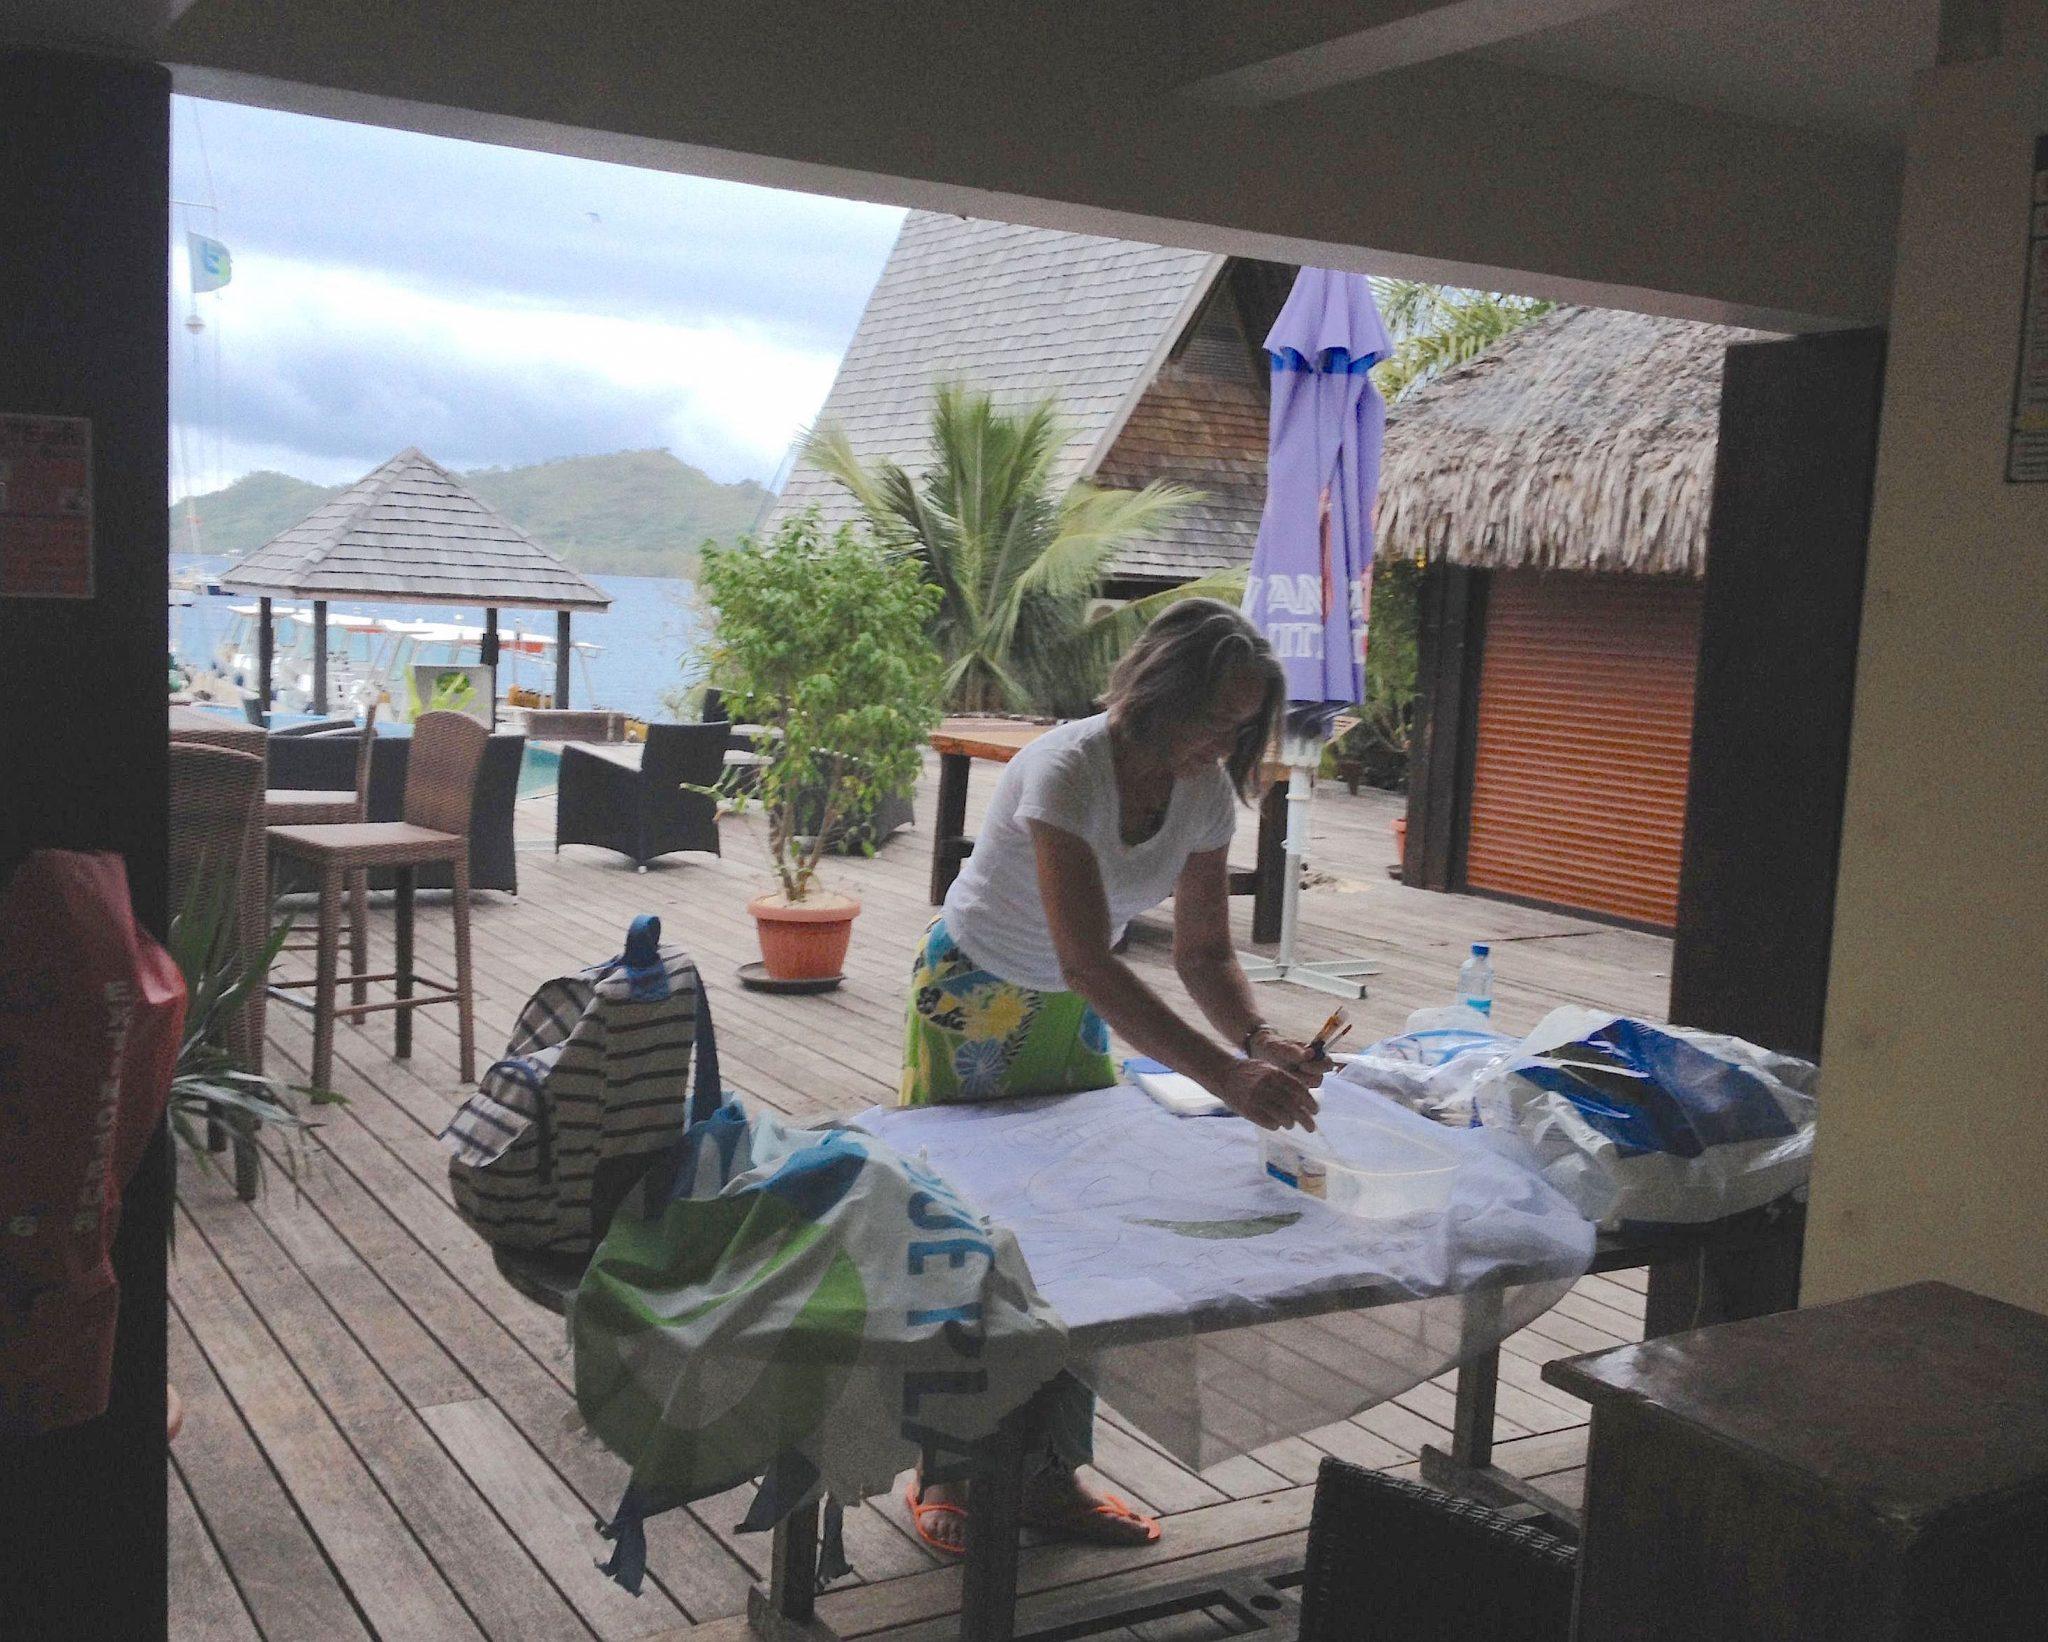 43. Anne paintied Joyful's new Blue Planet Odyssey flag on the veranda of the MaiKai Restaurant and Yacht Club in Bora Bora.